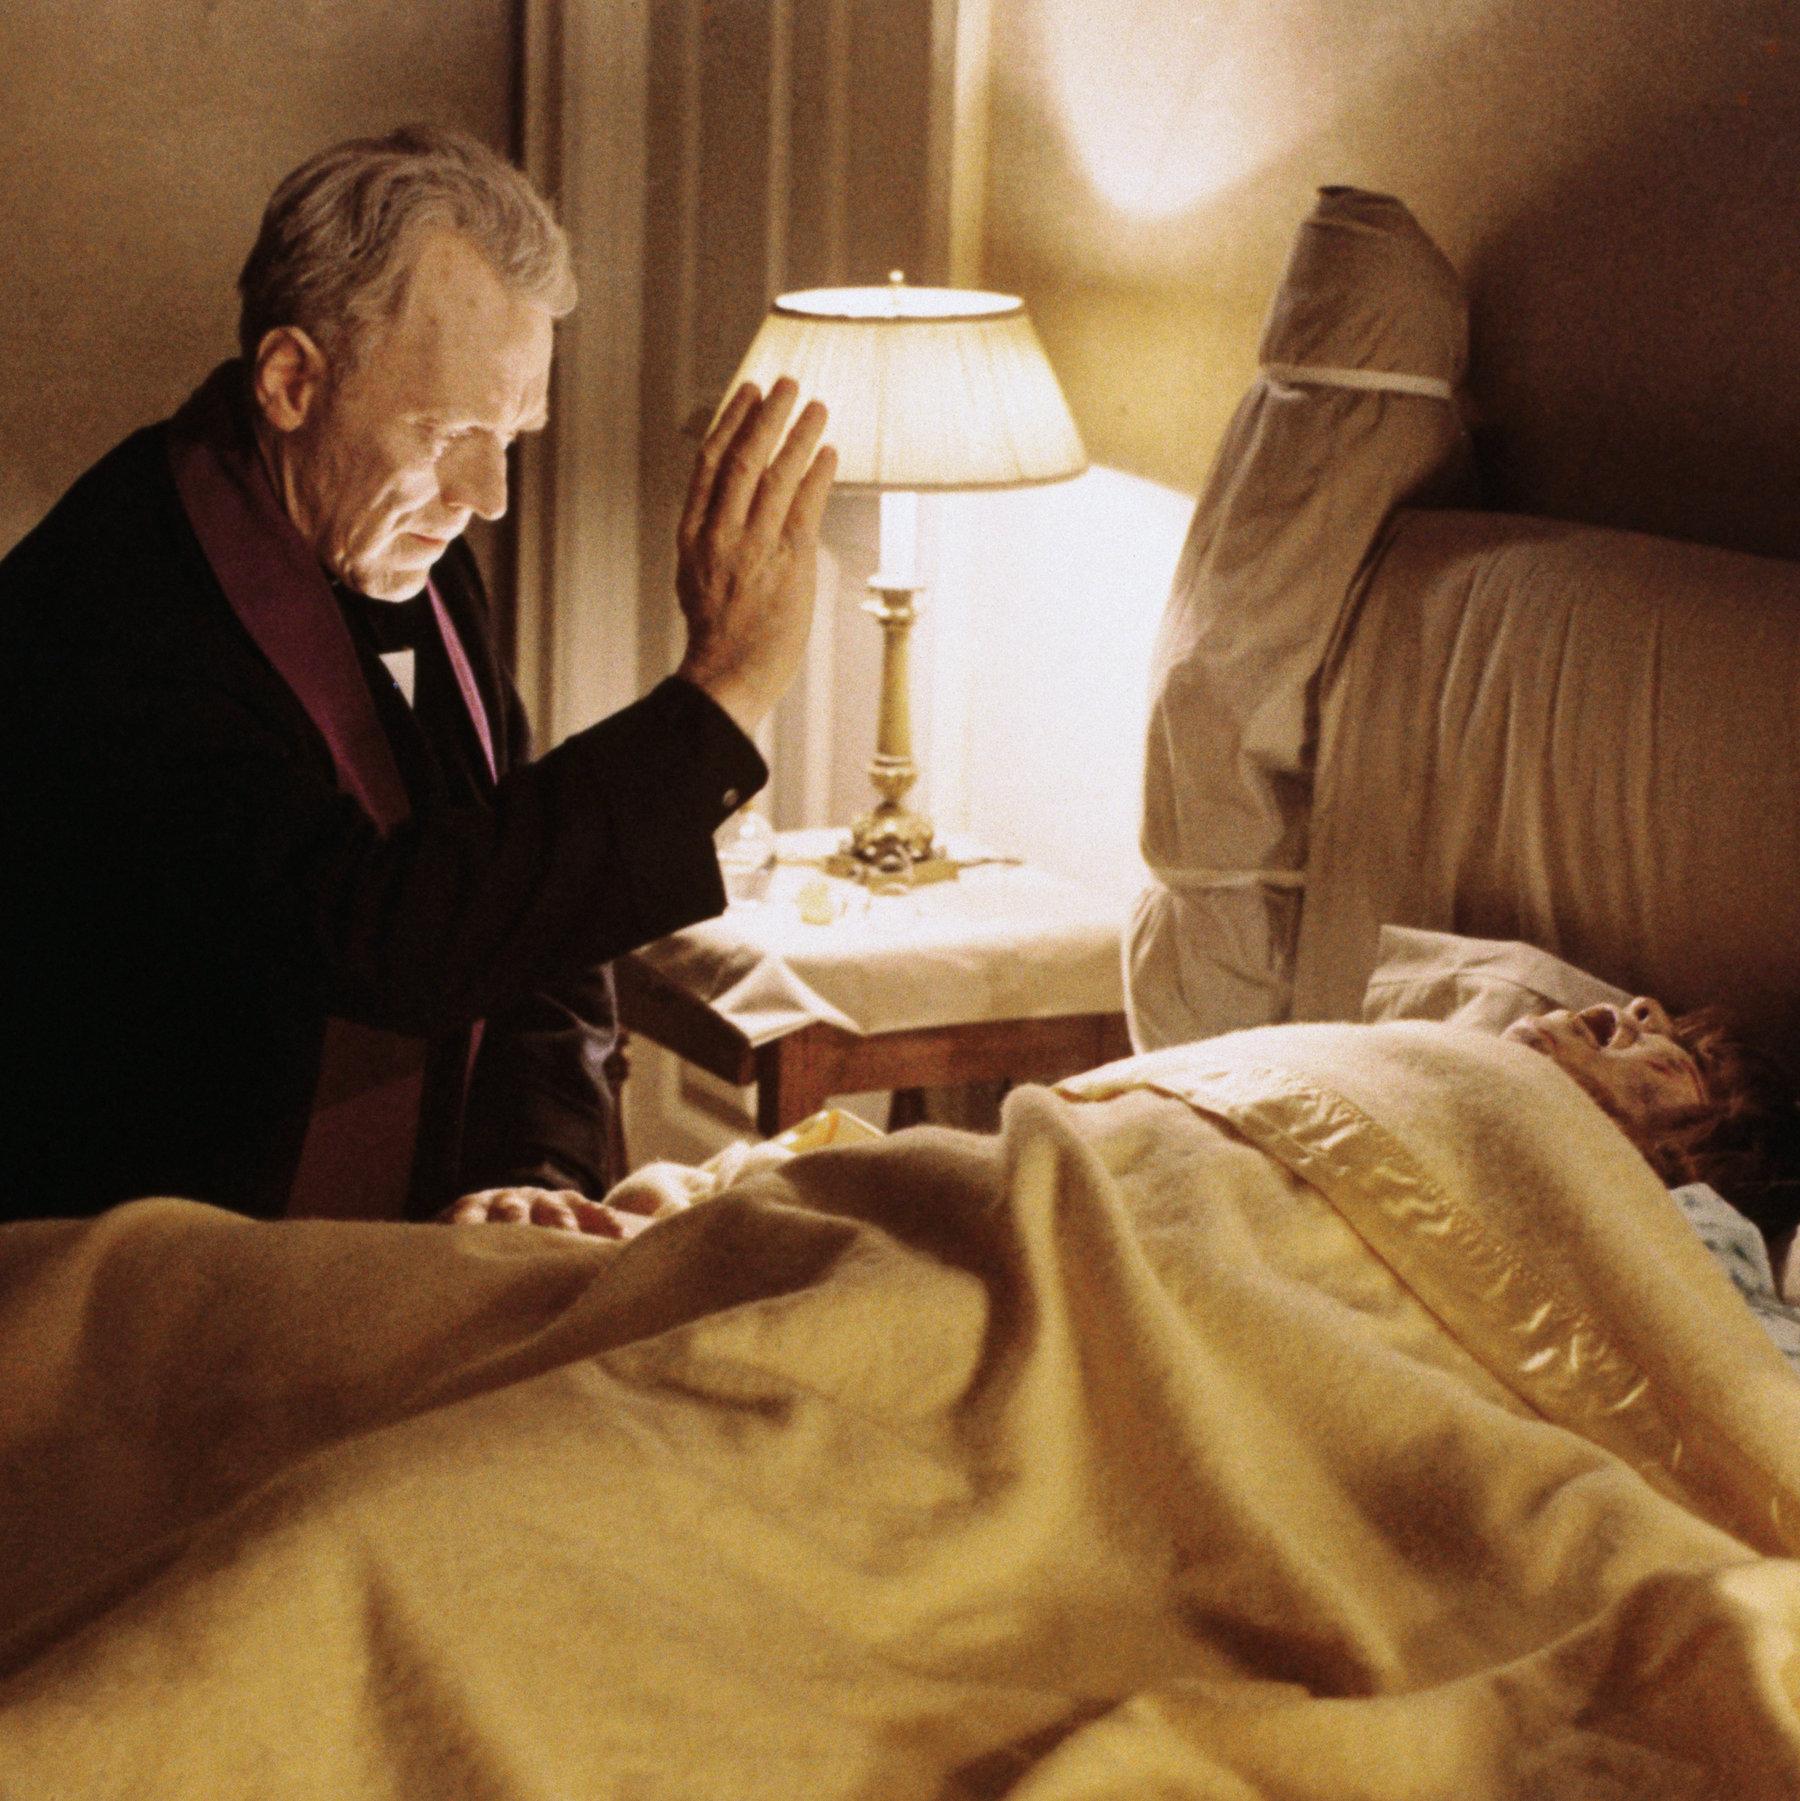 Max Von Sydow - The Exorcist - The scriptblog.com